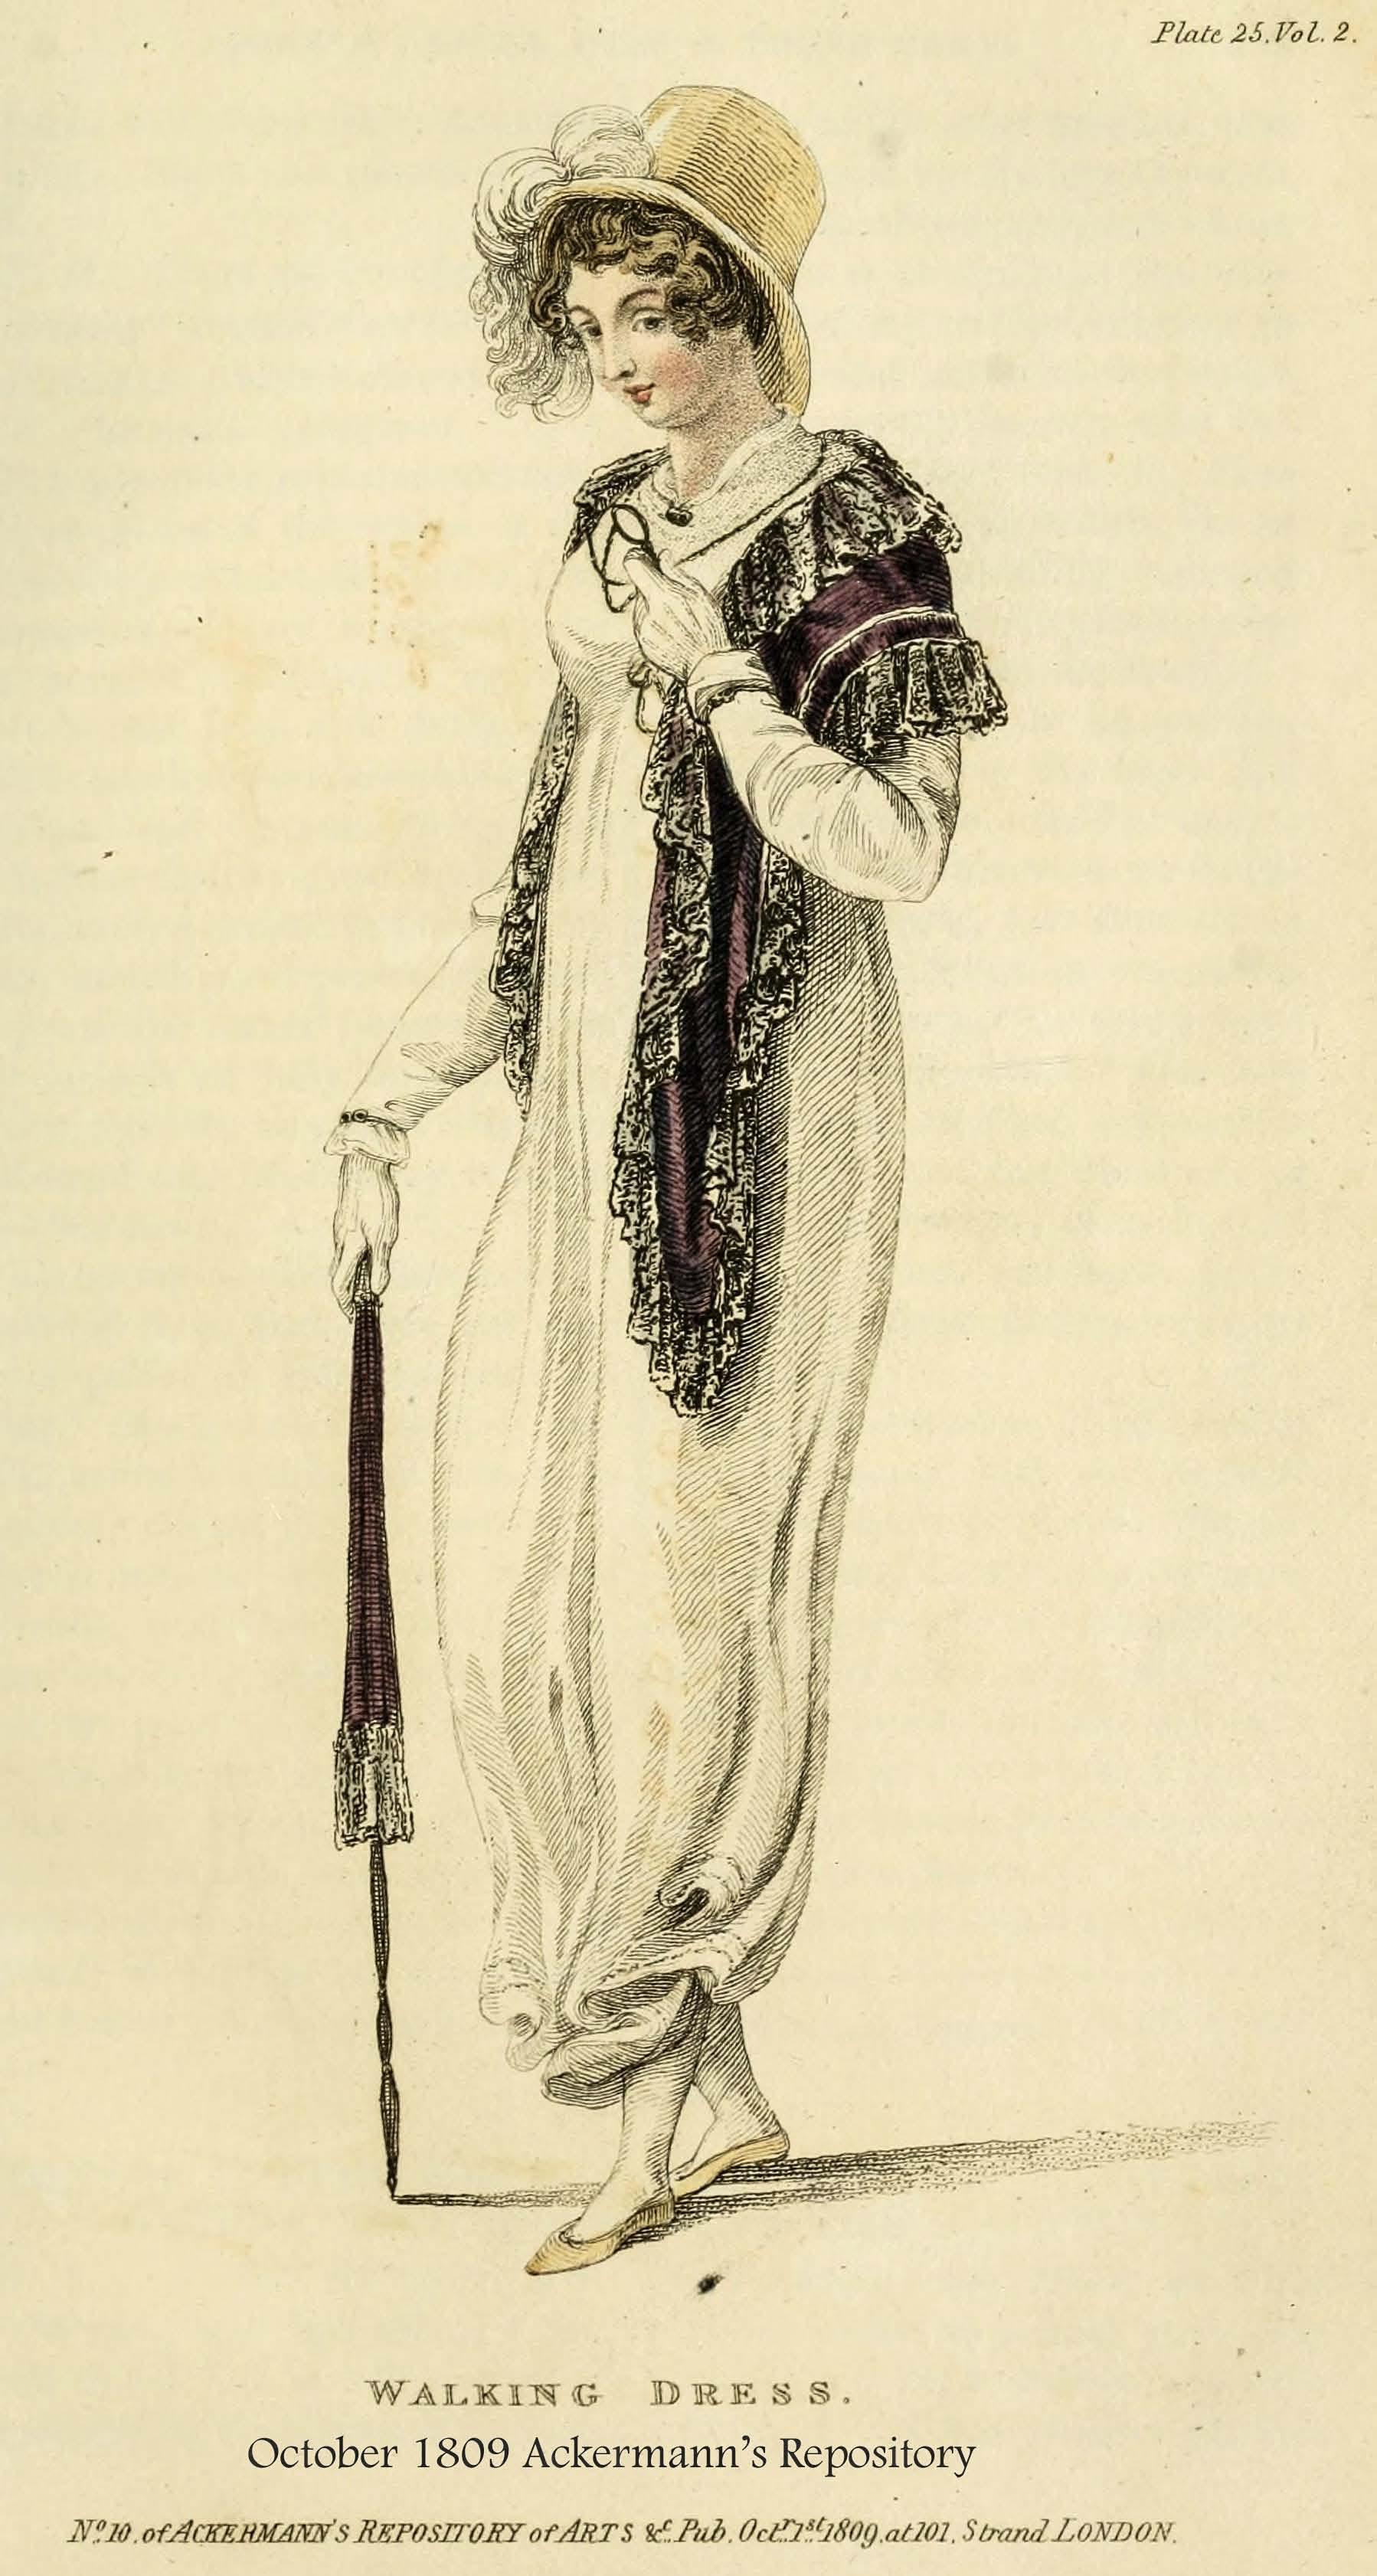 1809-10 Walking Dress Ackermann-copy_edited-1.jpg